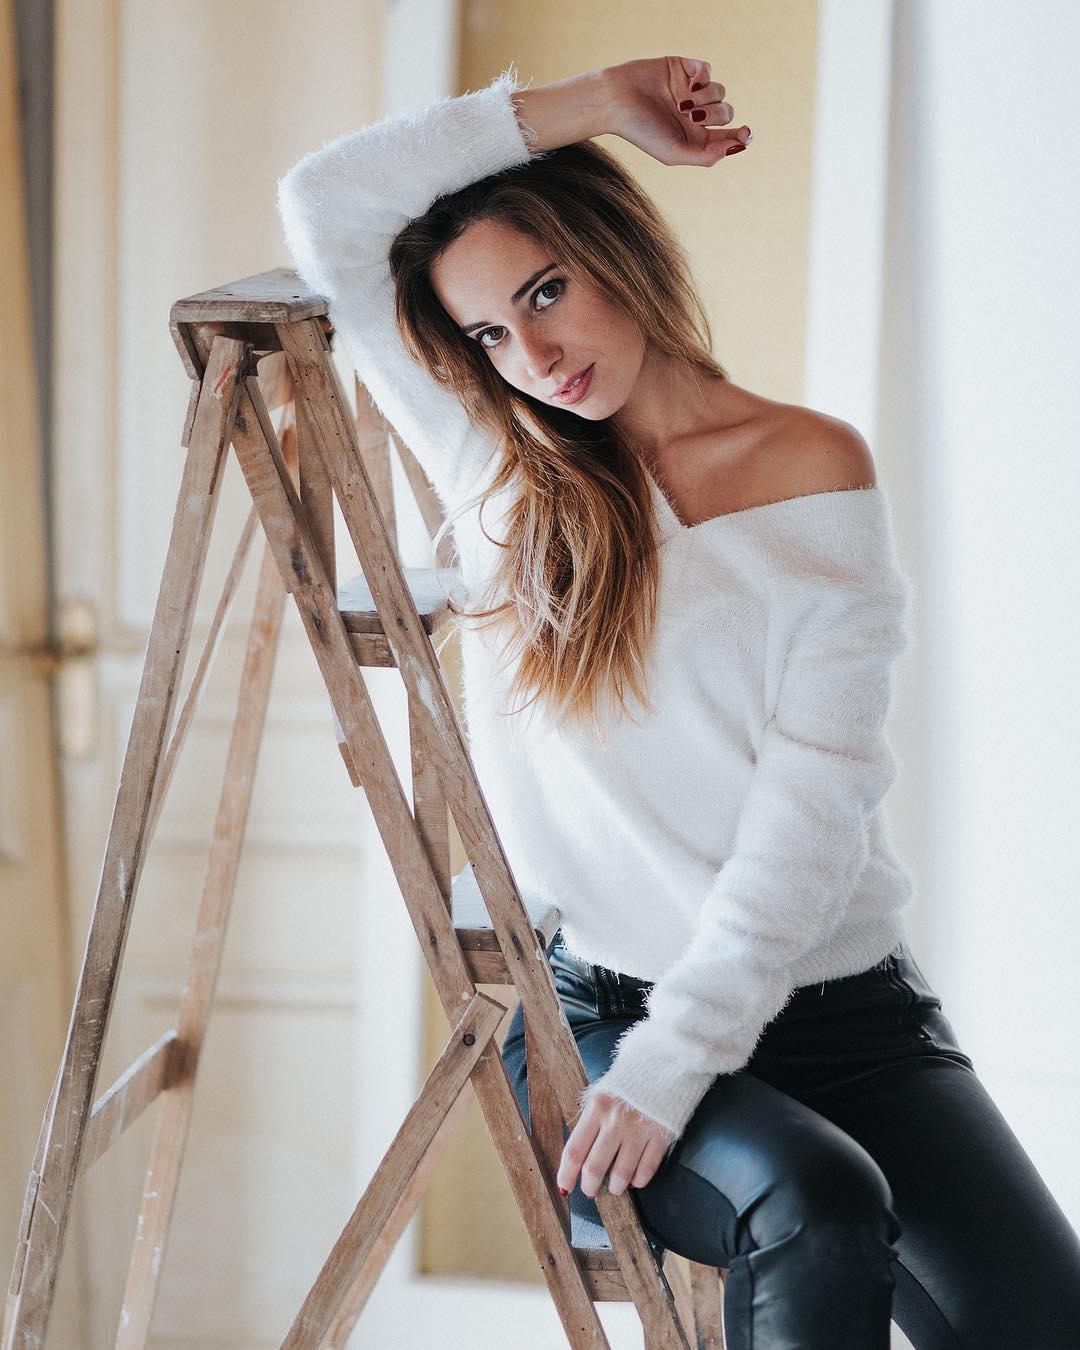 Cristina-Clea-Wallpapers-Insta-Fit-Bio-13